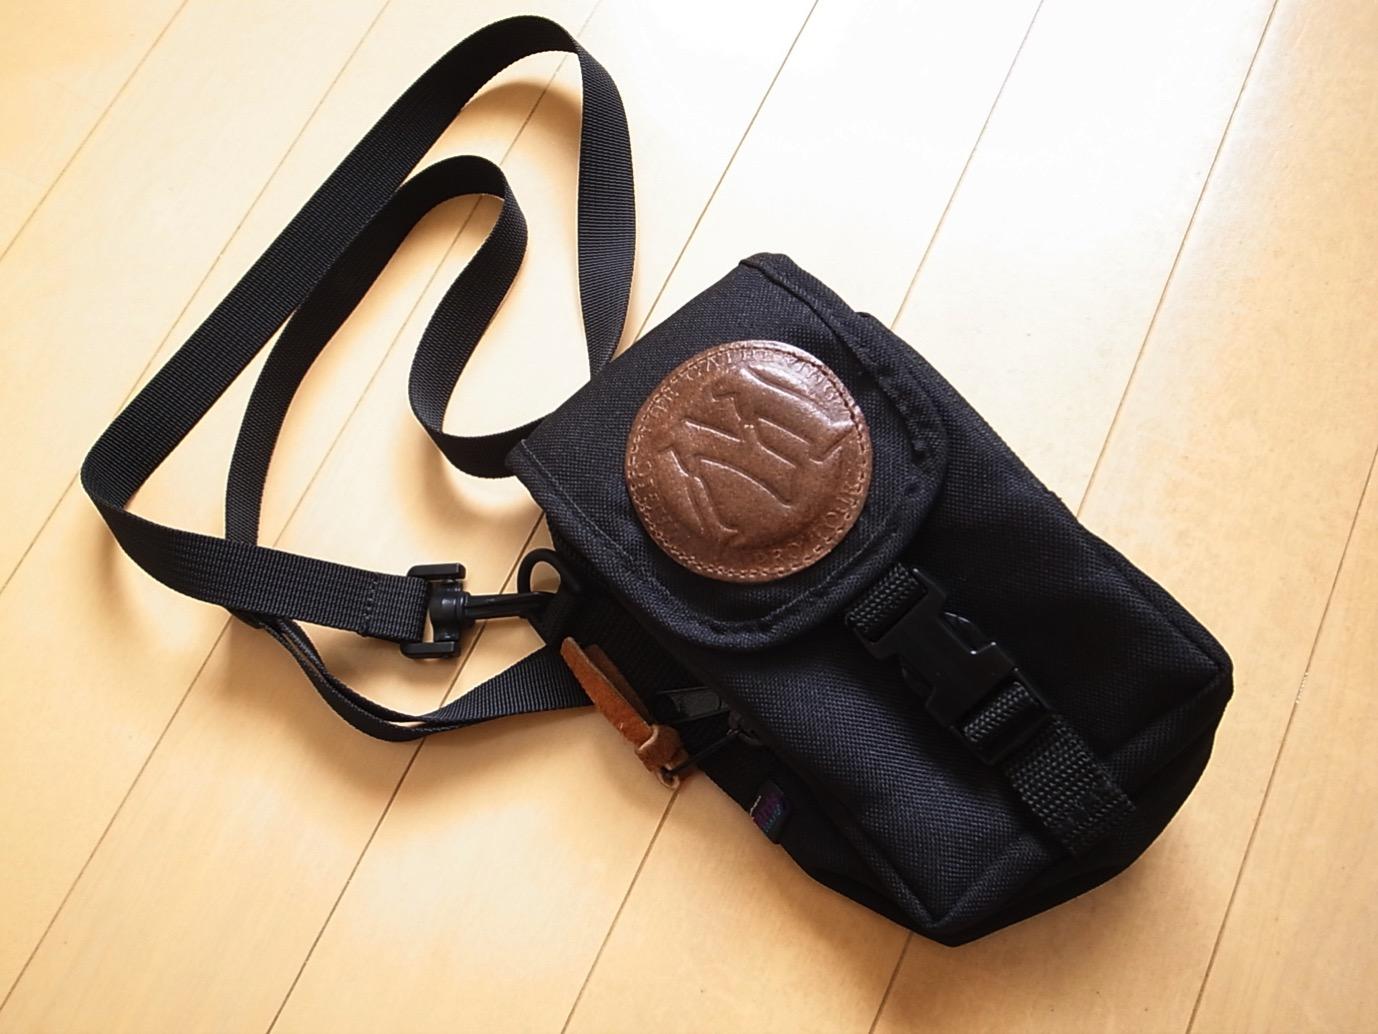 Mtg bag 4